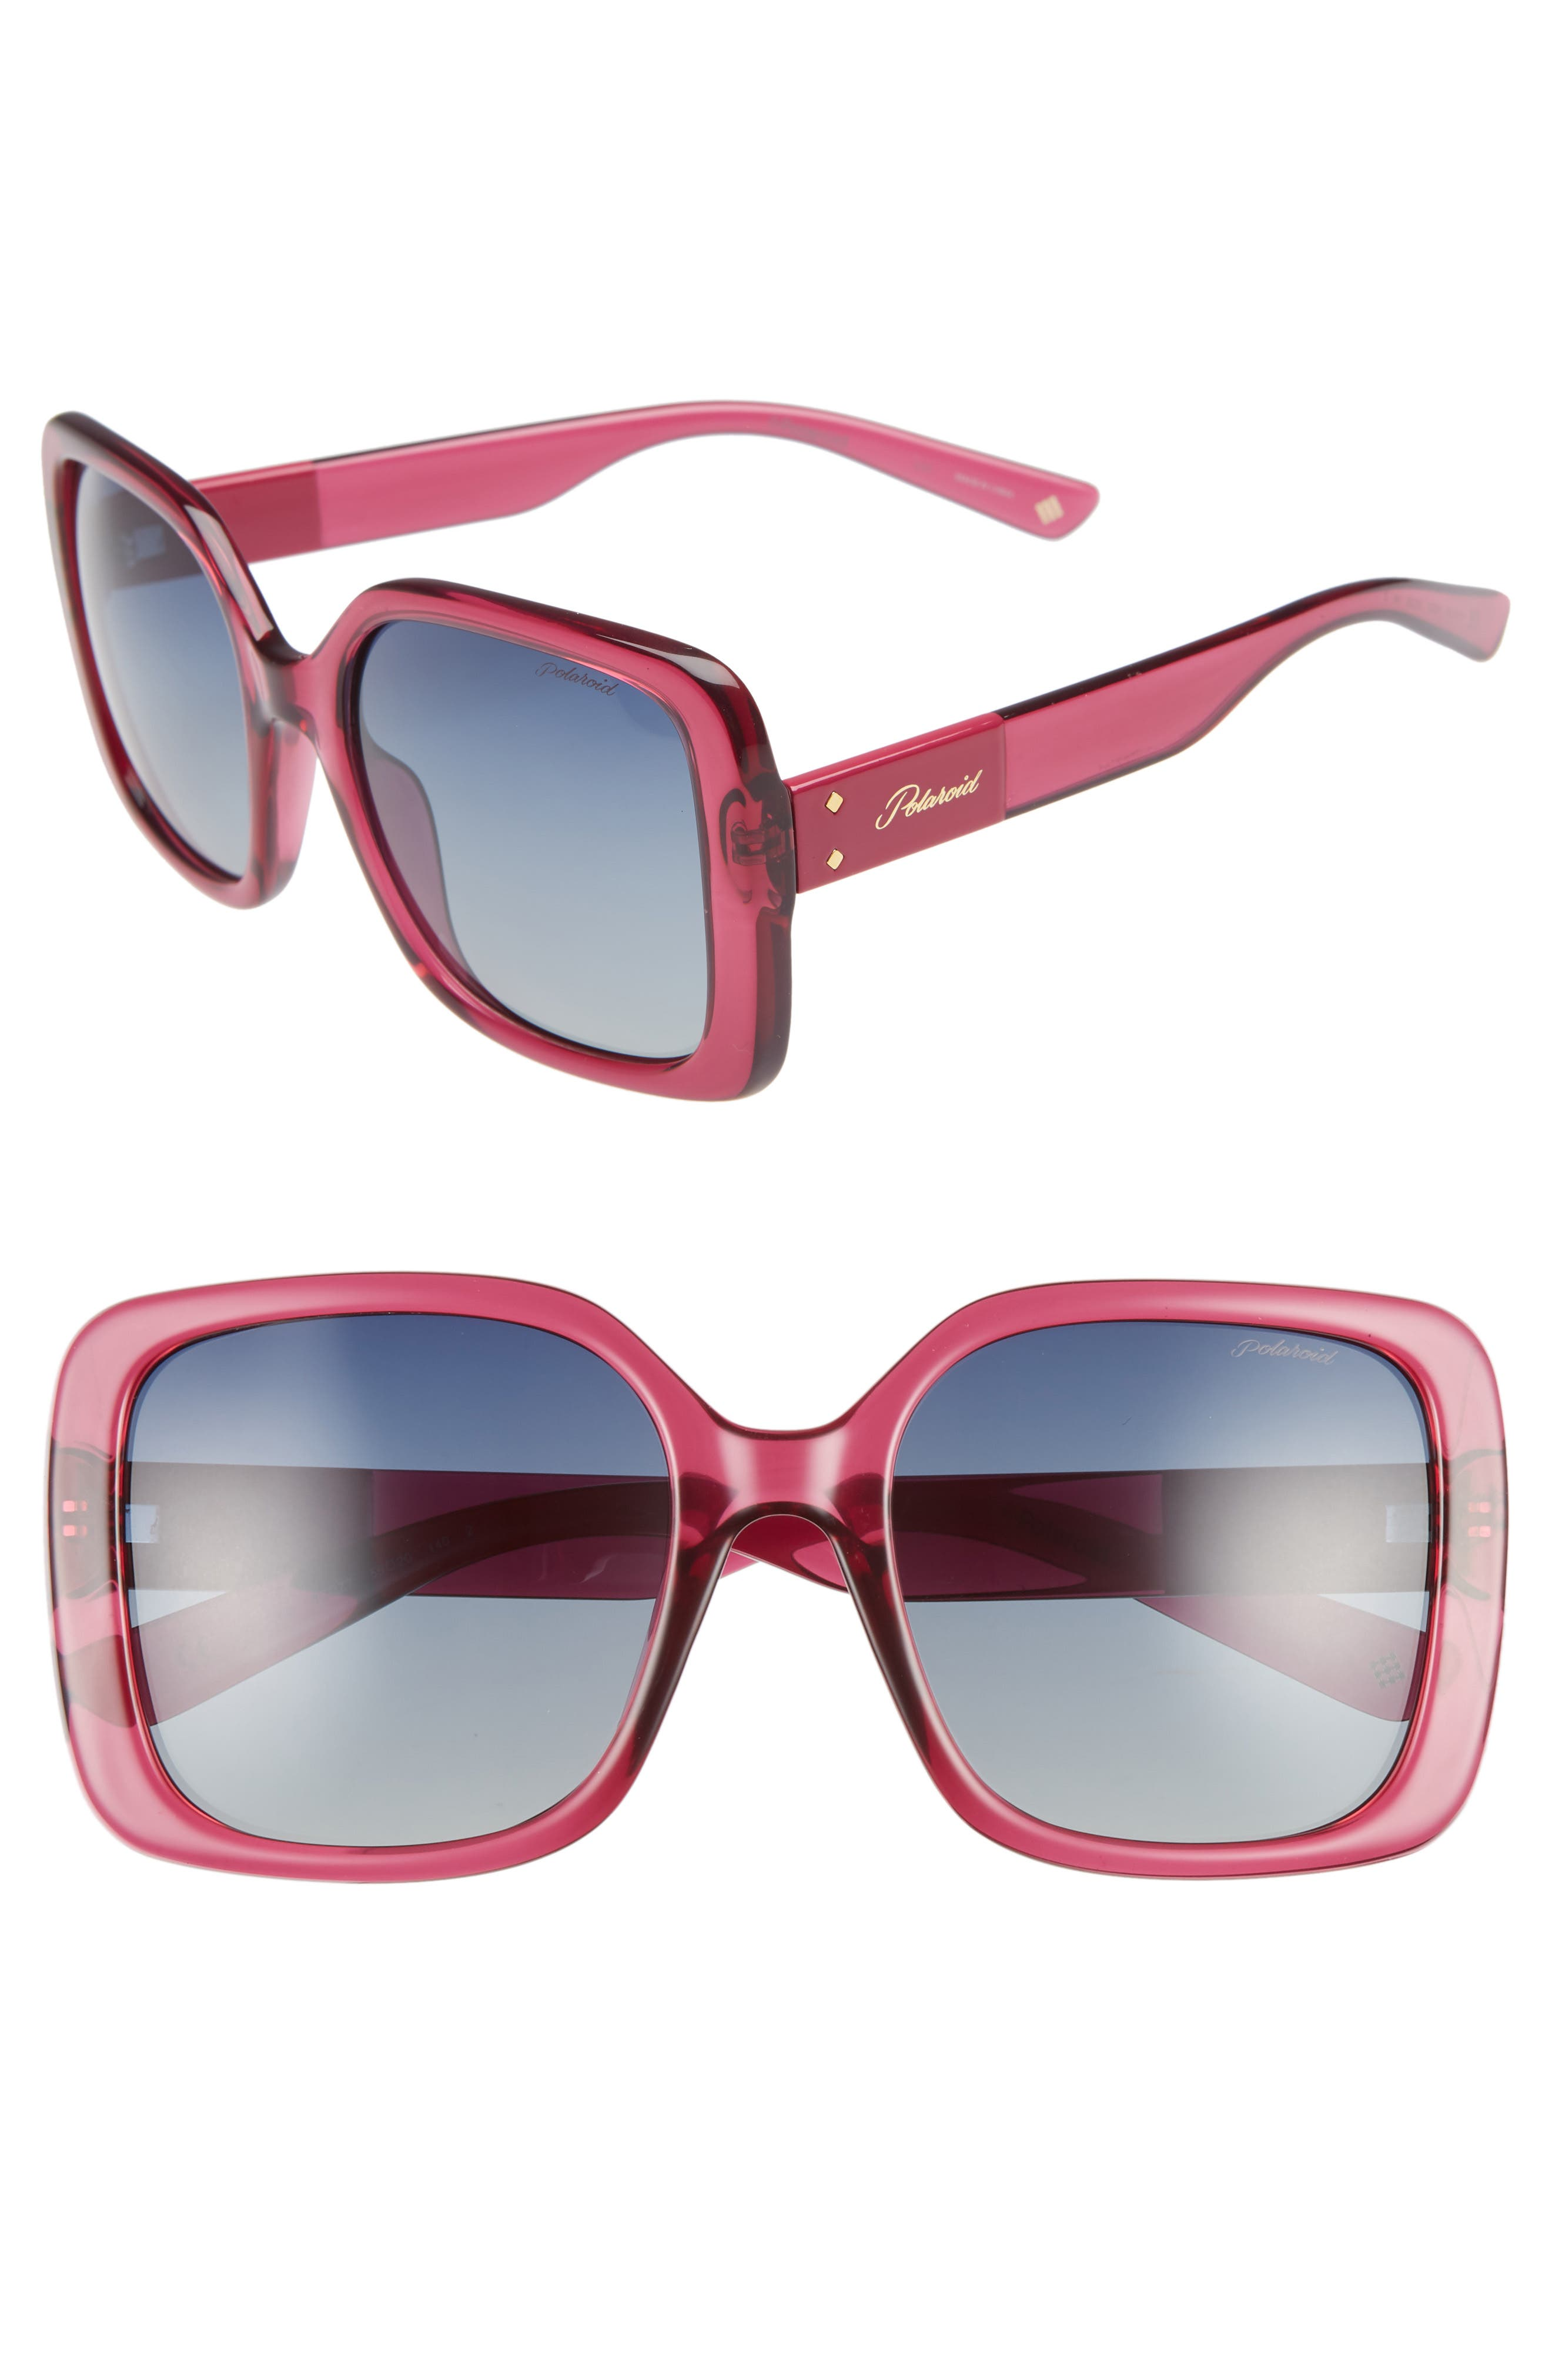 Polaroid 55Mm Polarized Square Sunglasses - Cherry